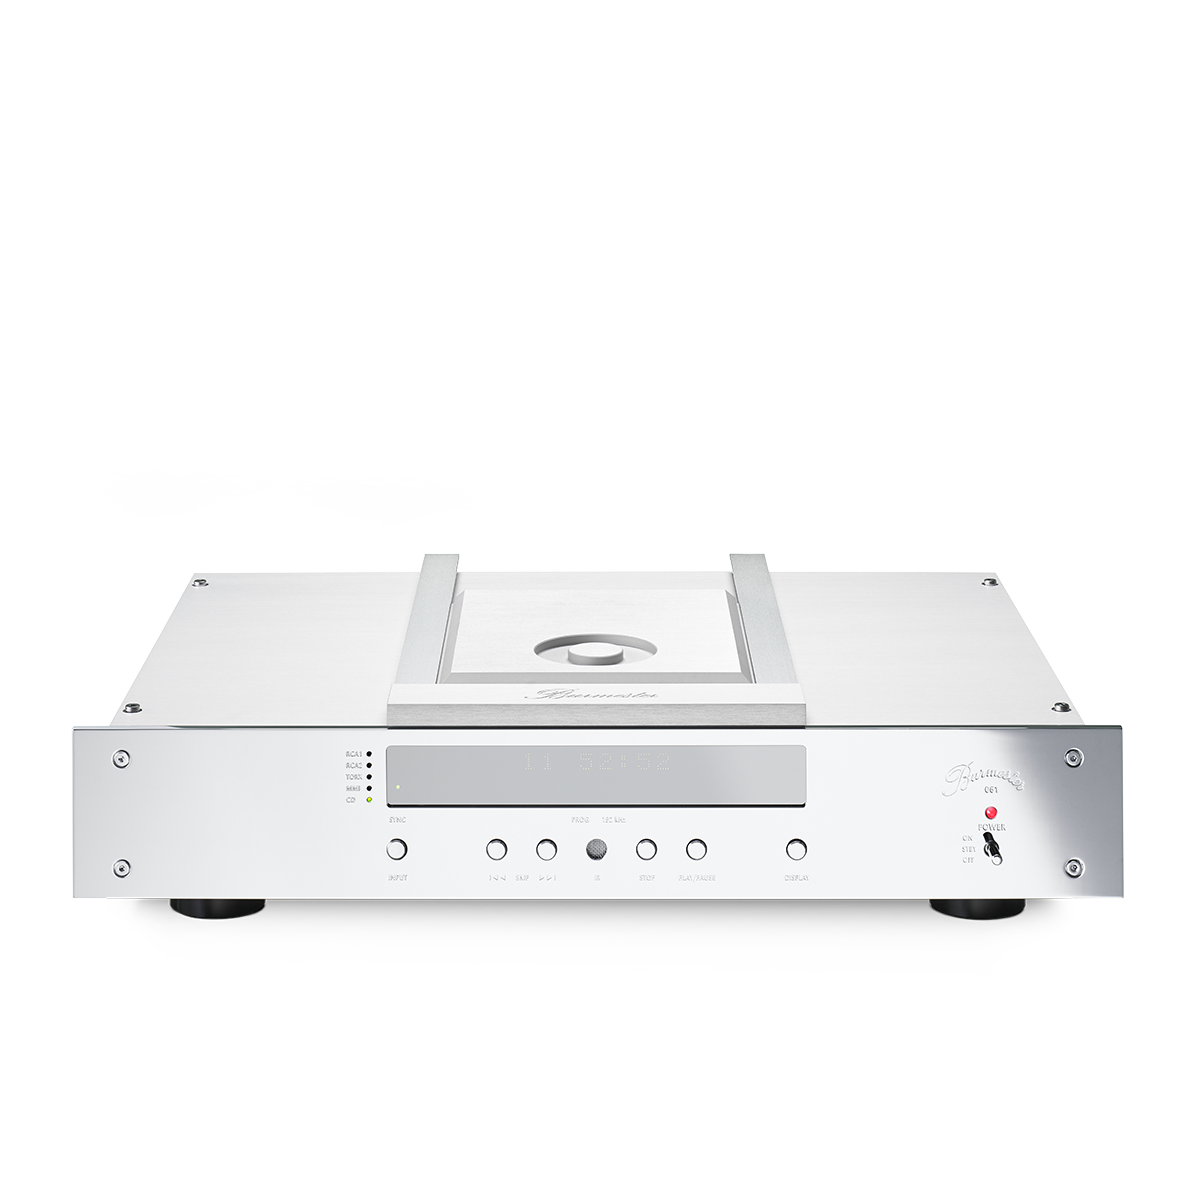 Burmester Classic 061 Top Loader CD Player